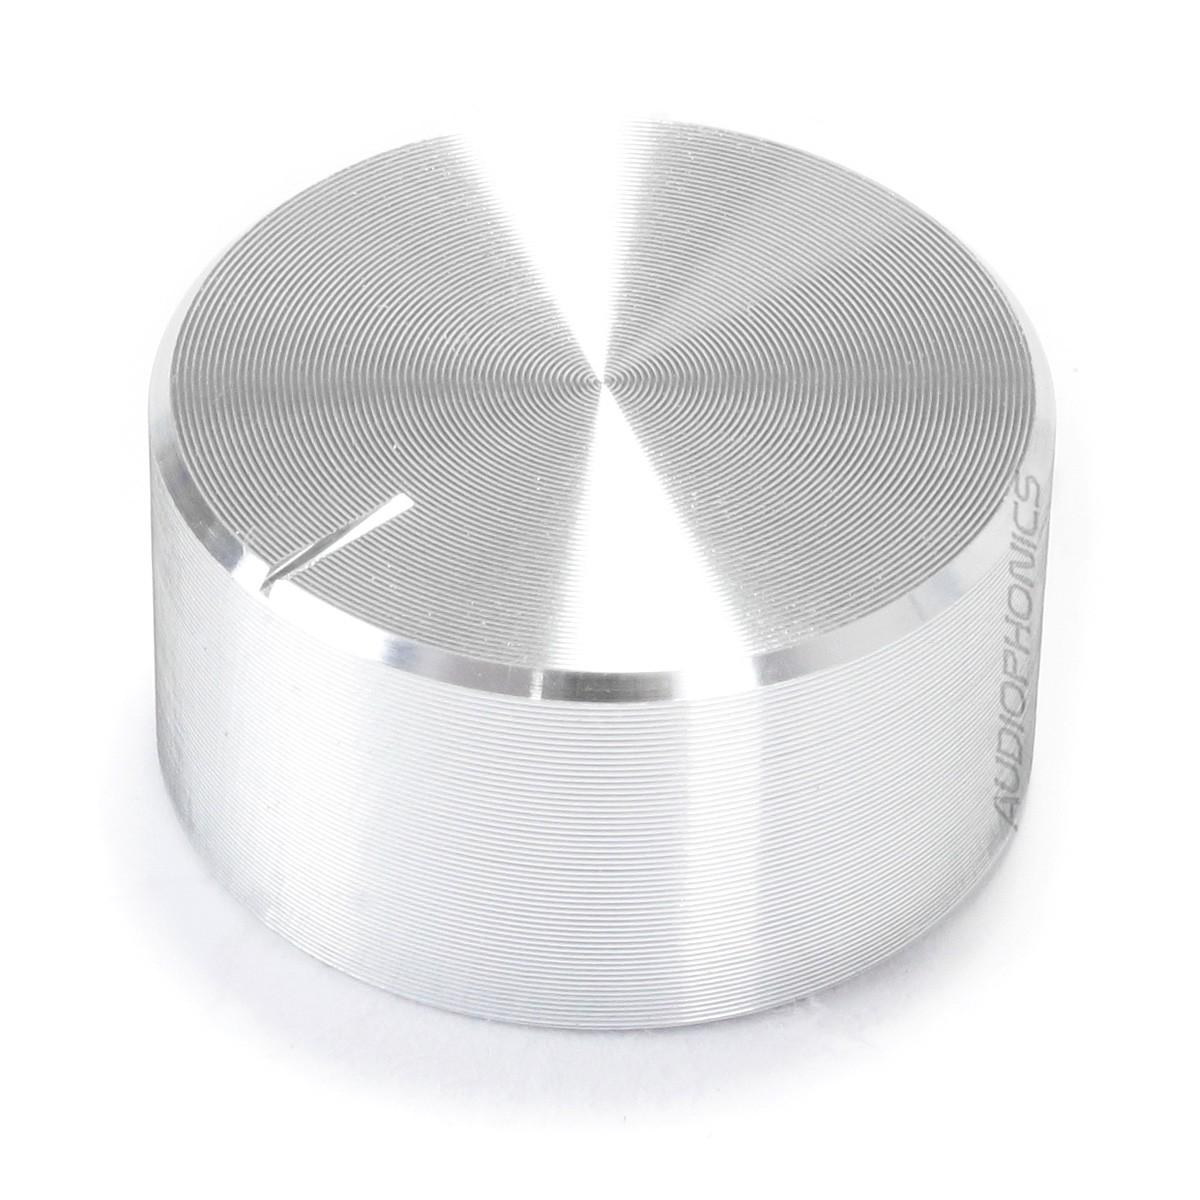 Knob Aluminium Notched Shaft 25x13mm Ø6mm Silver